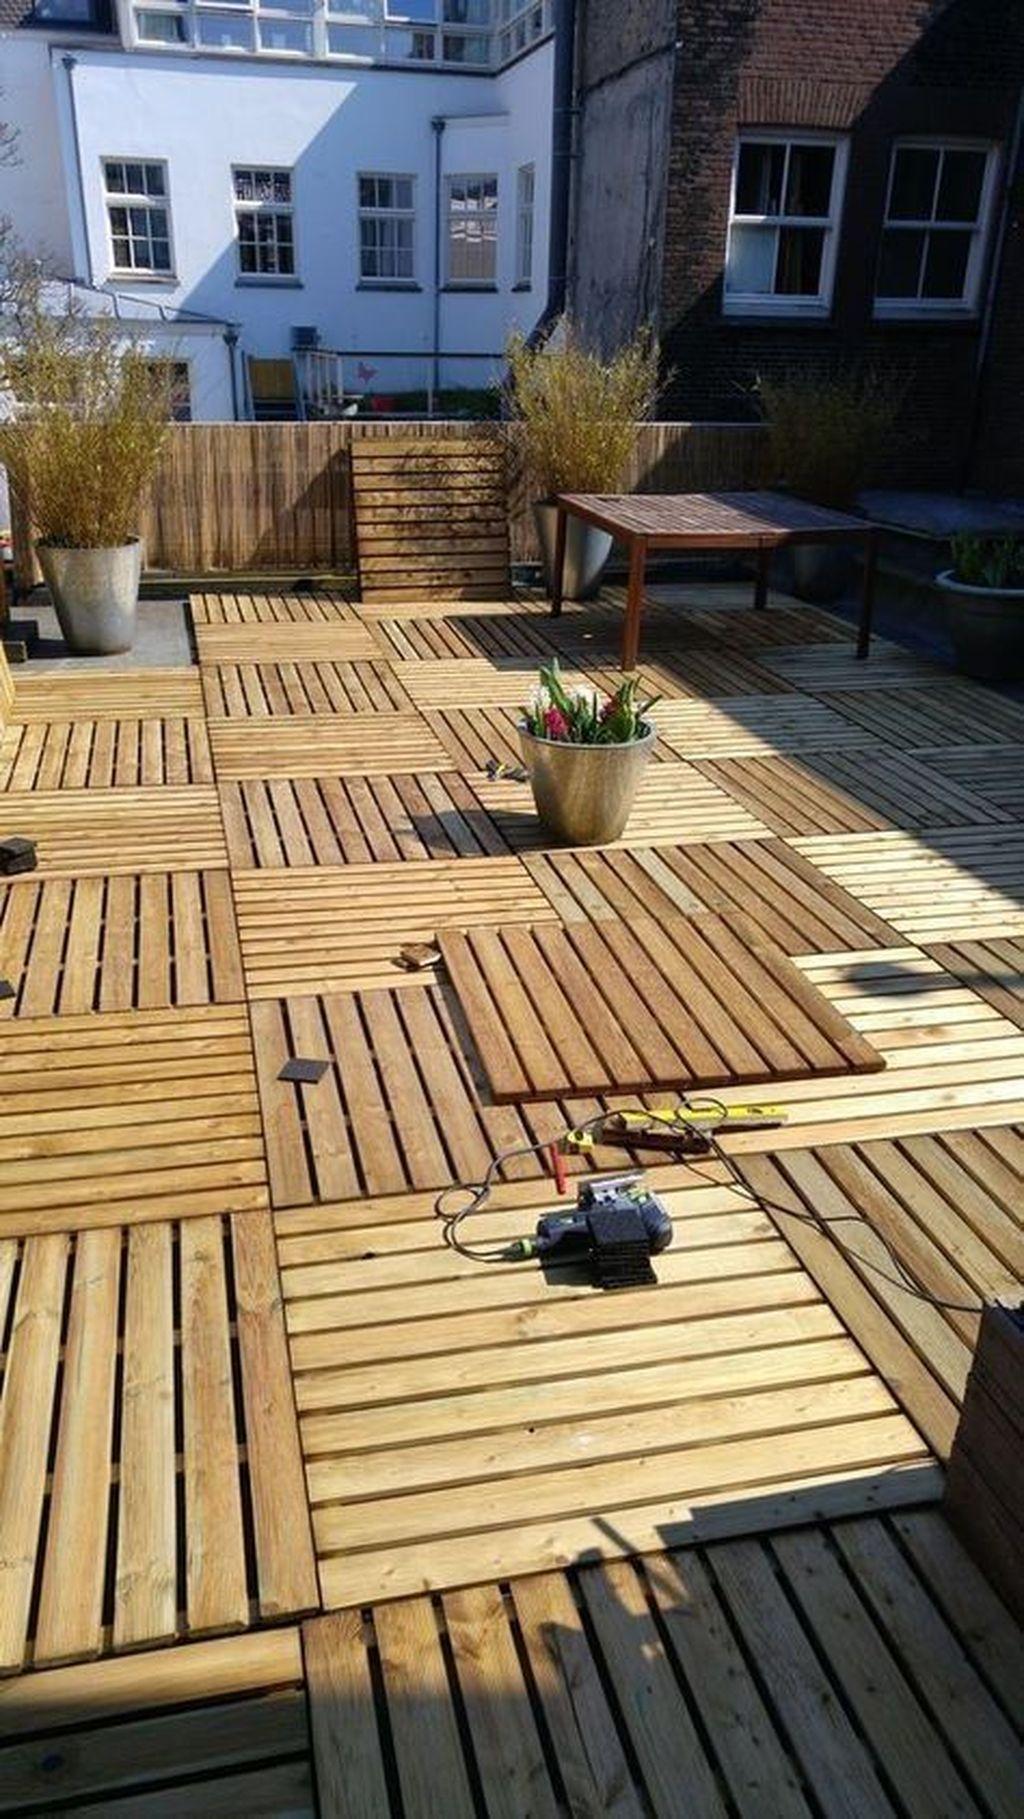 34 fantastic diy pallet ideas for outdoor spring